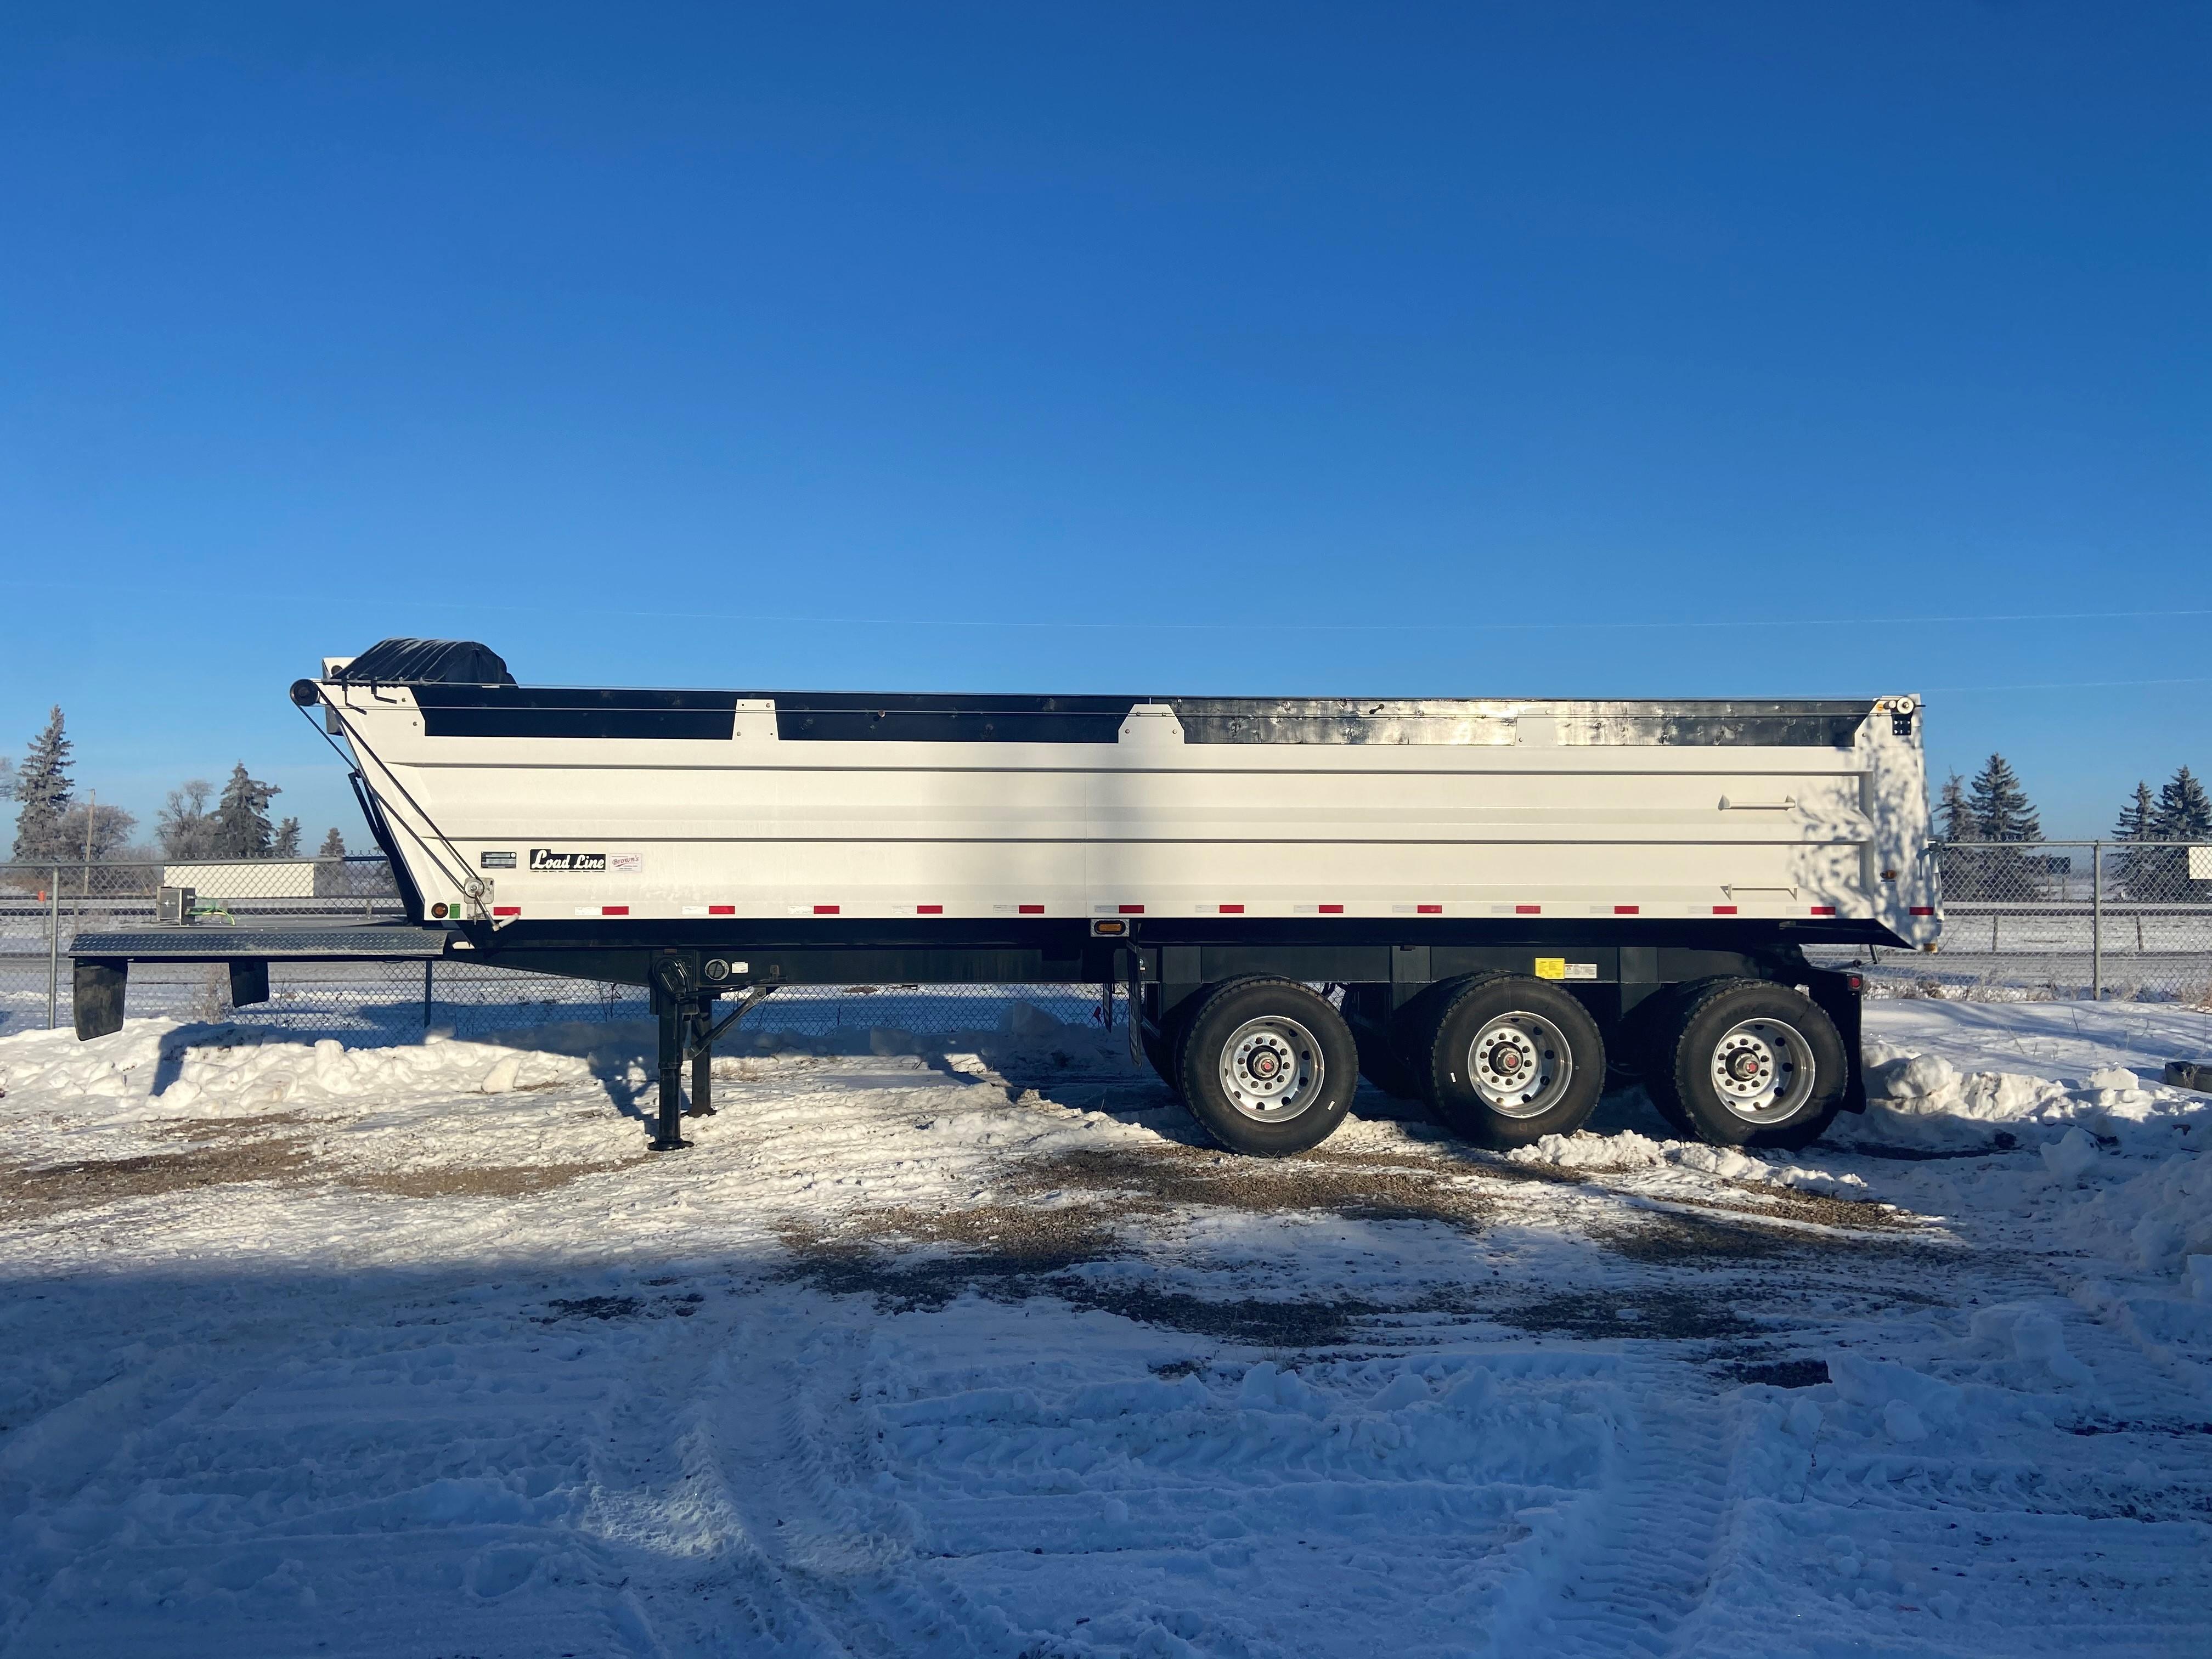 Used, 2019, Miscellaneous, Load Line 35' Tri-Axle End Dump Trailer, Dump Trailers